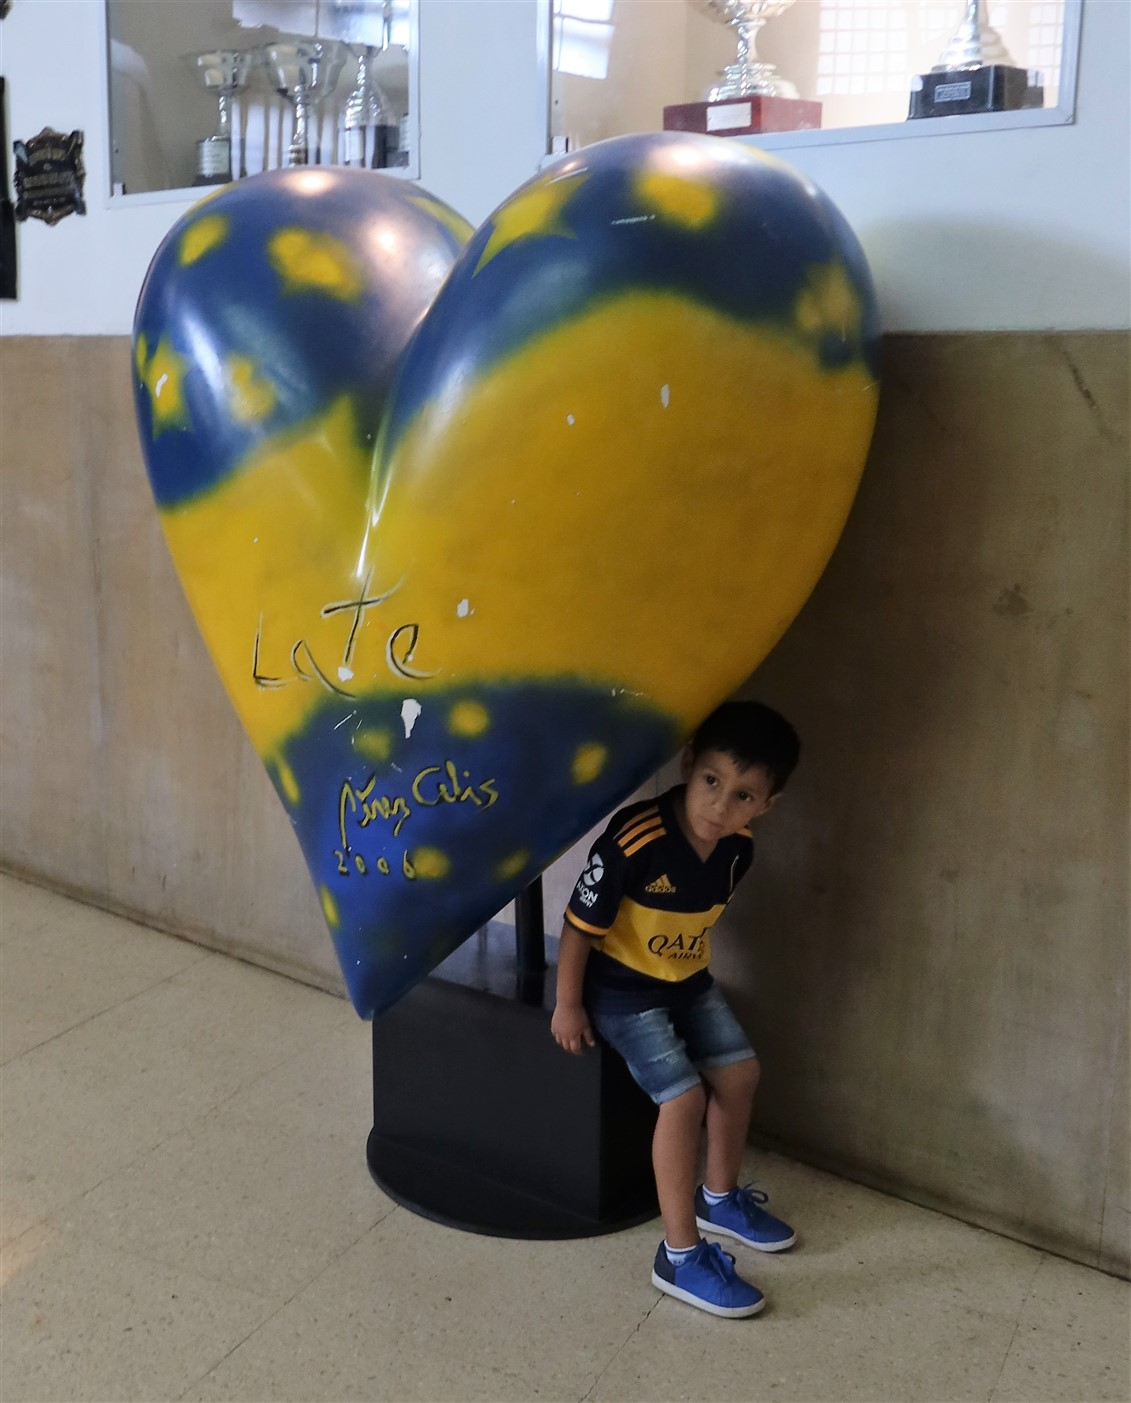 2020 03 08 76 Buenos Aires Boca Juniors Soccer Team.jpg